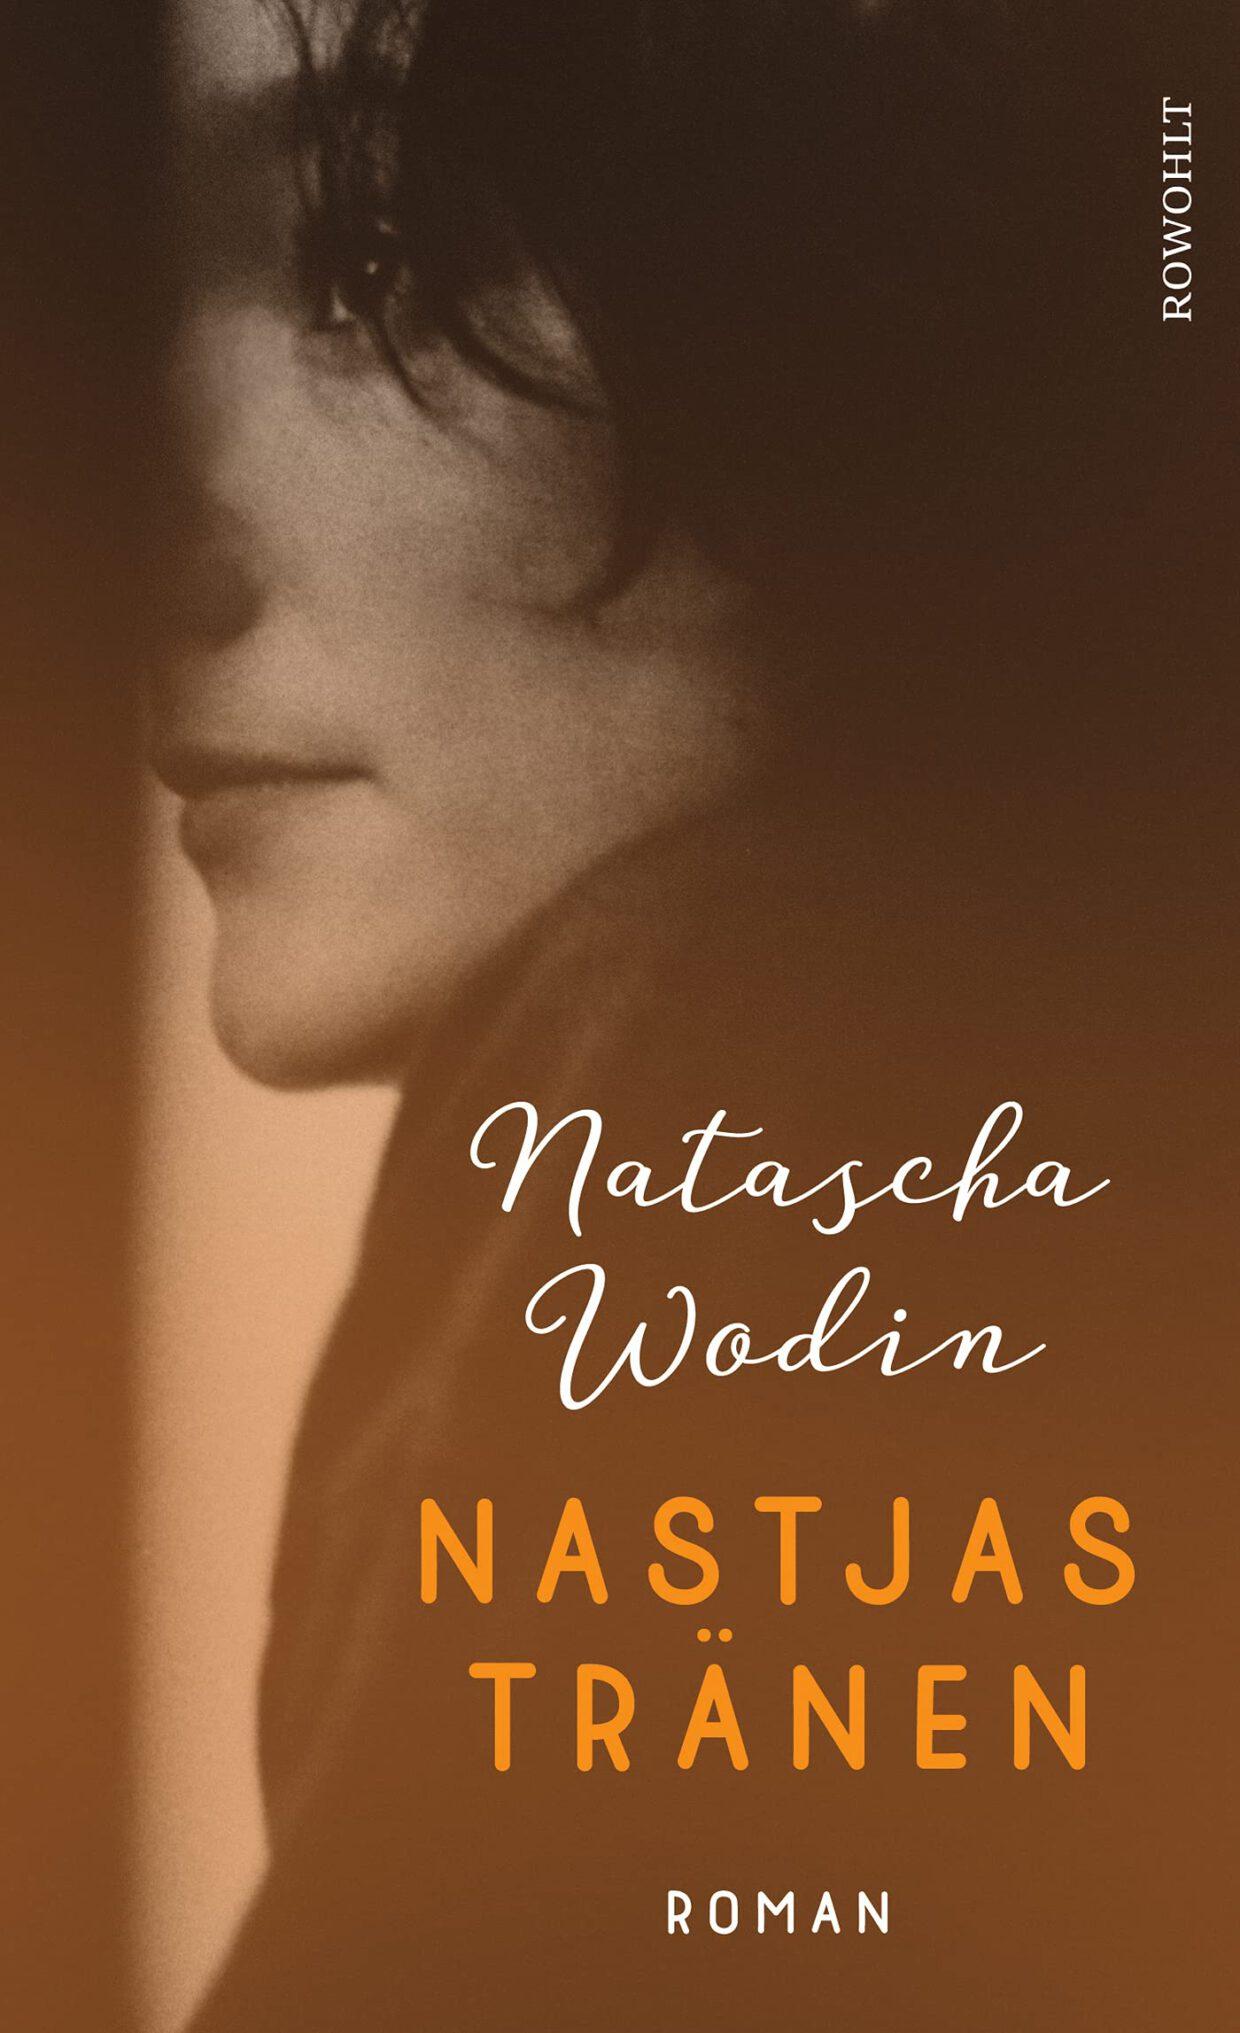 Natascha Wodin: Nastjas Tränen